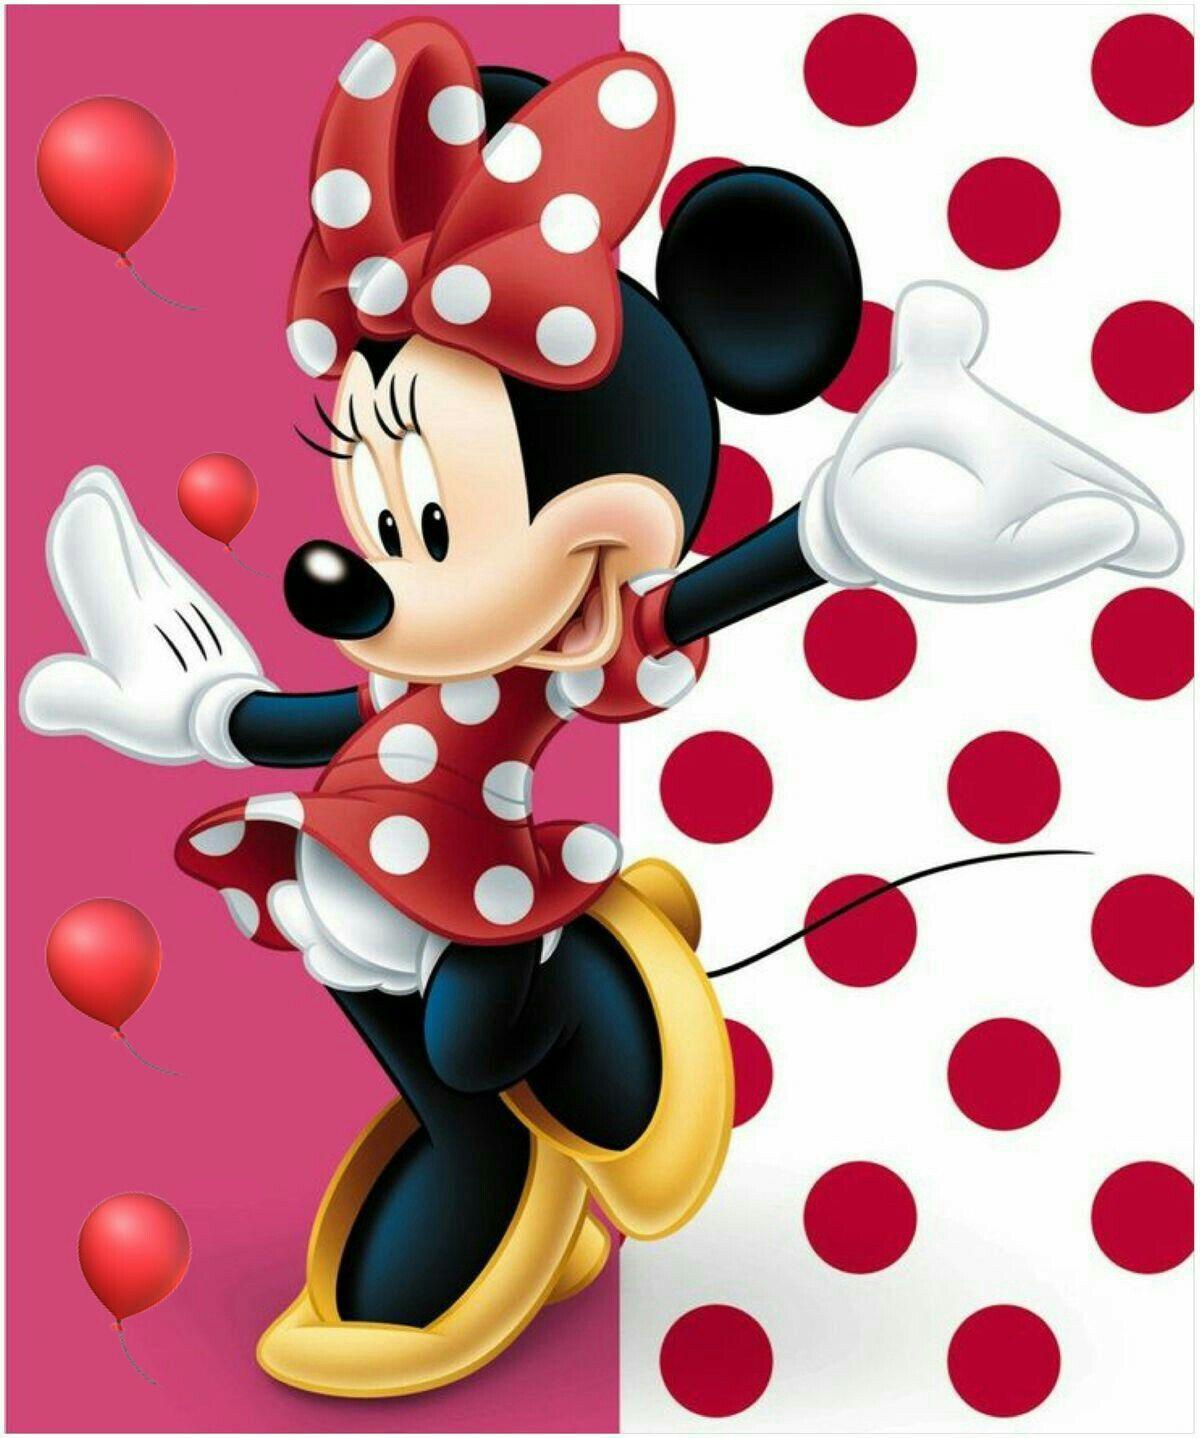 Minnie Imagenes De Mimi Mouse Imagenes De Mimi Imagenes Minnie